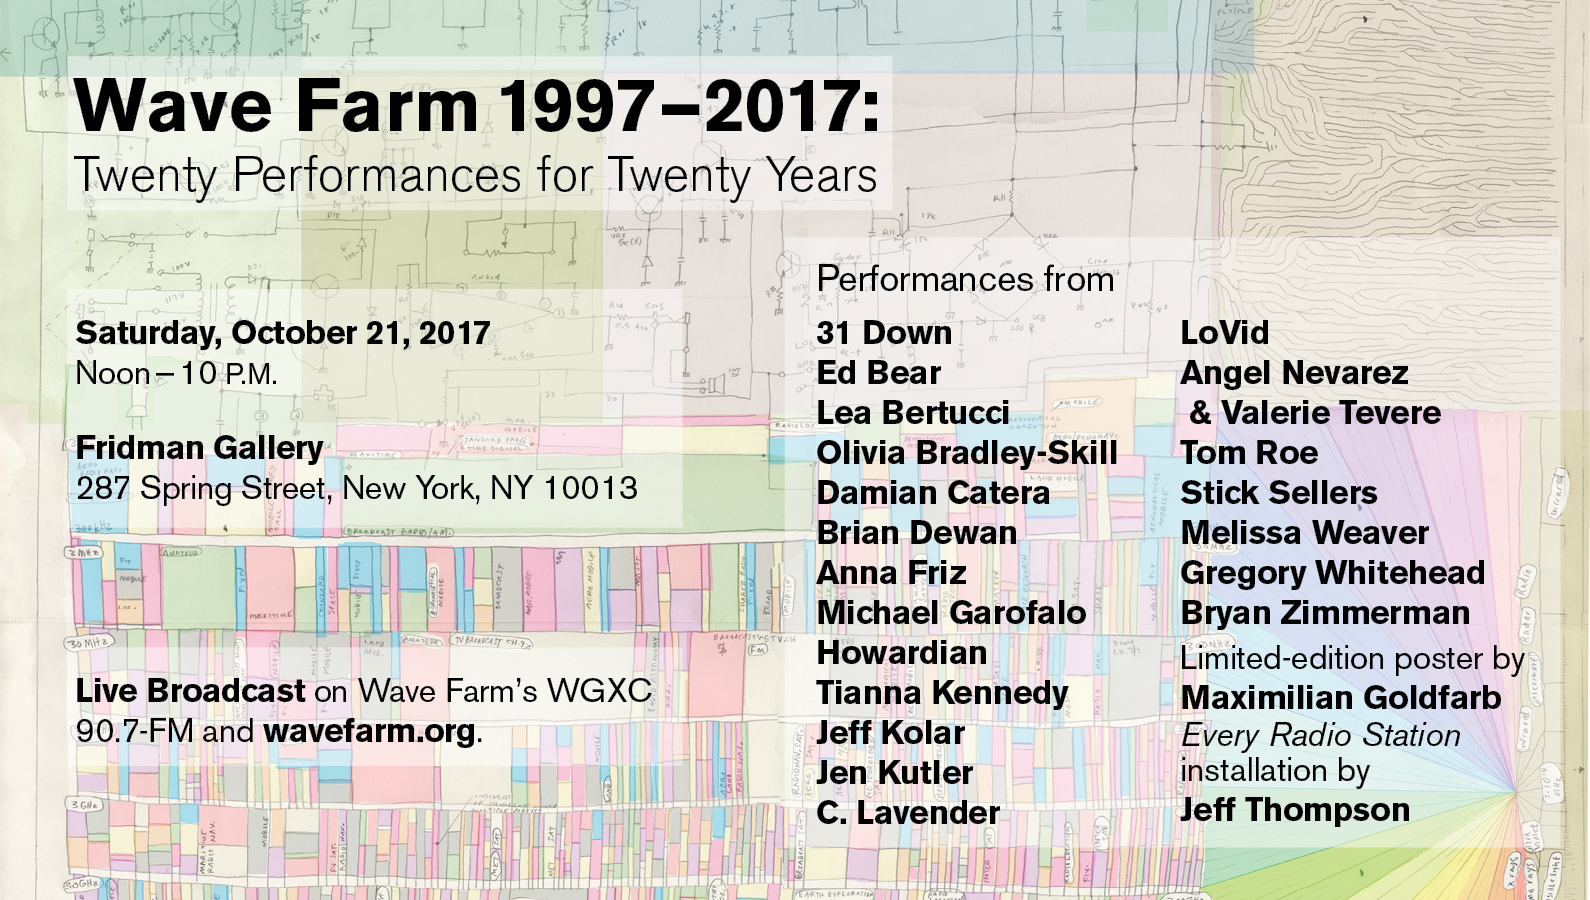 Wave Farm 1997-2017: Twenty Performances for Twenty Years Website Image